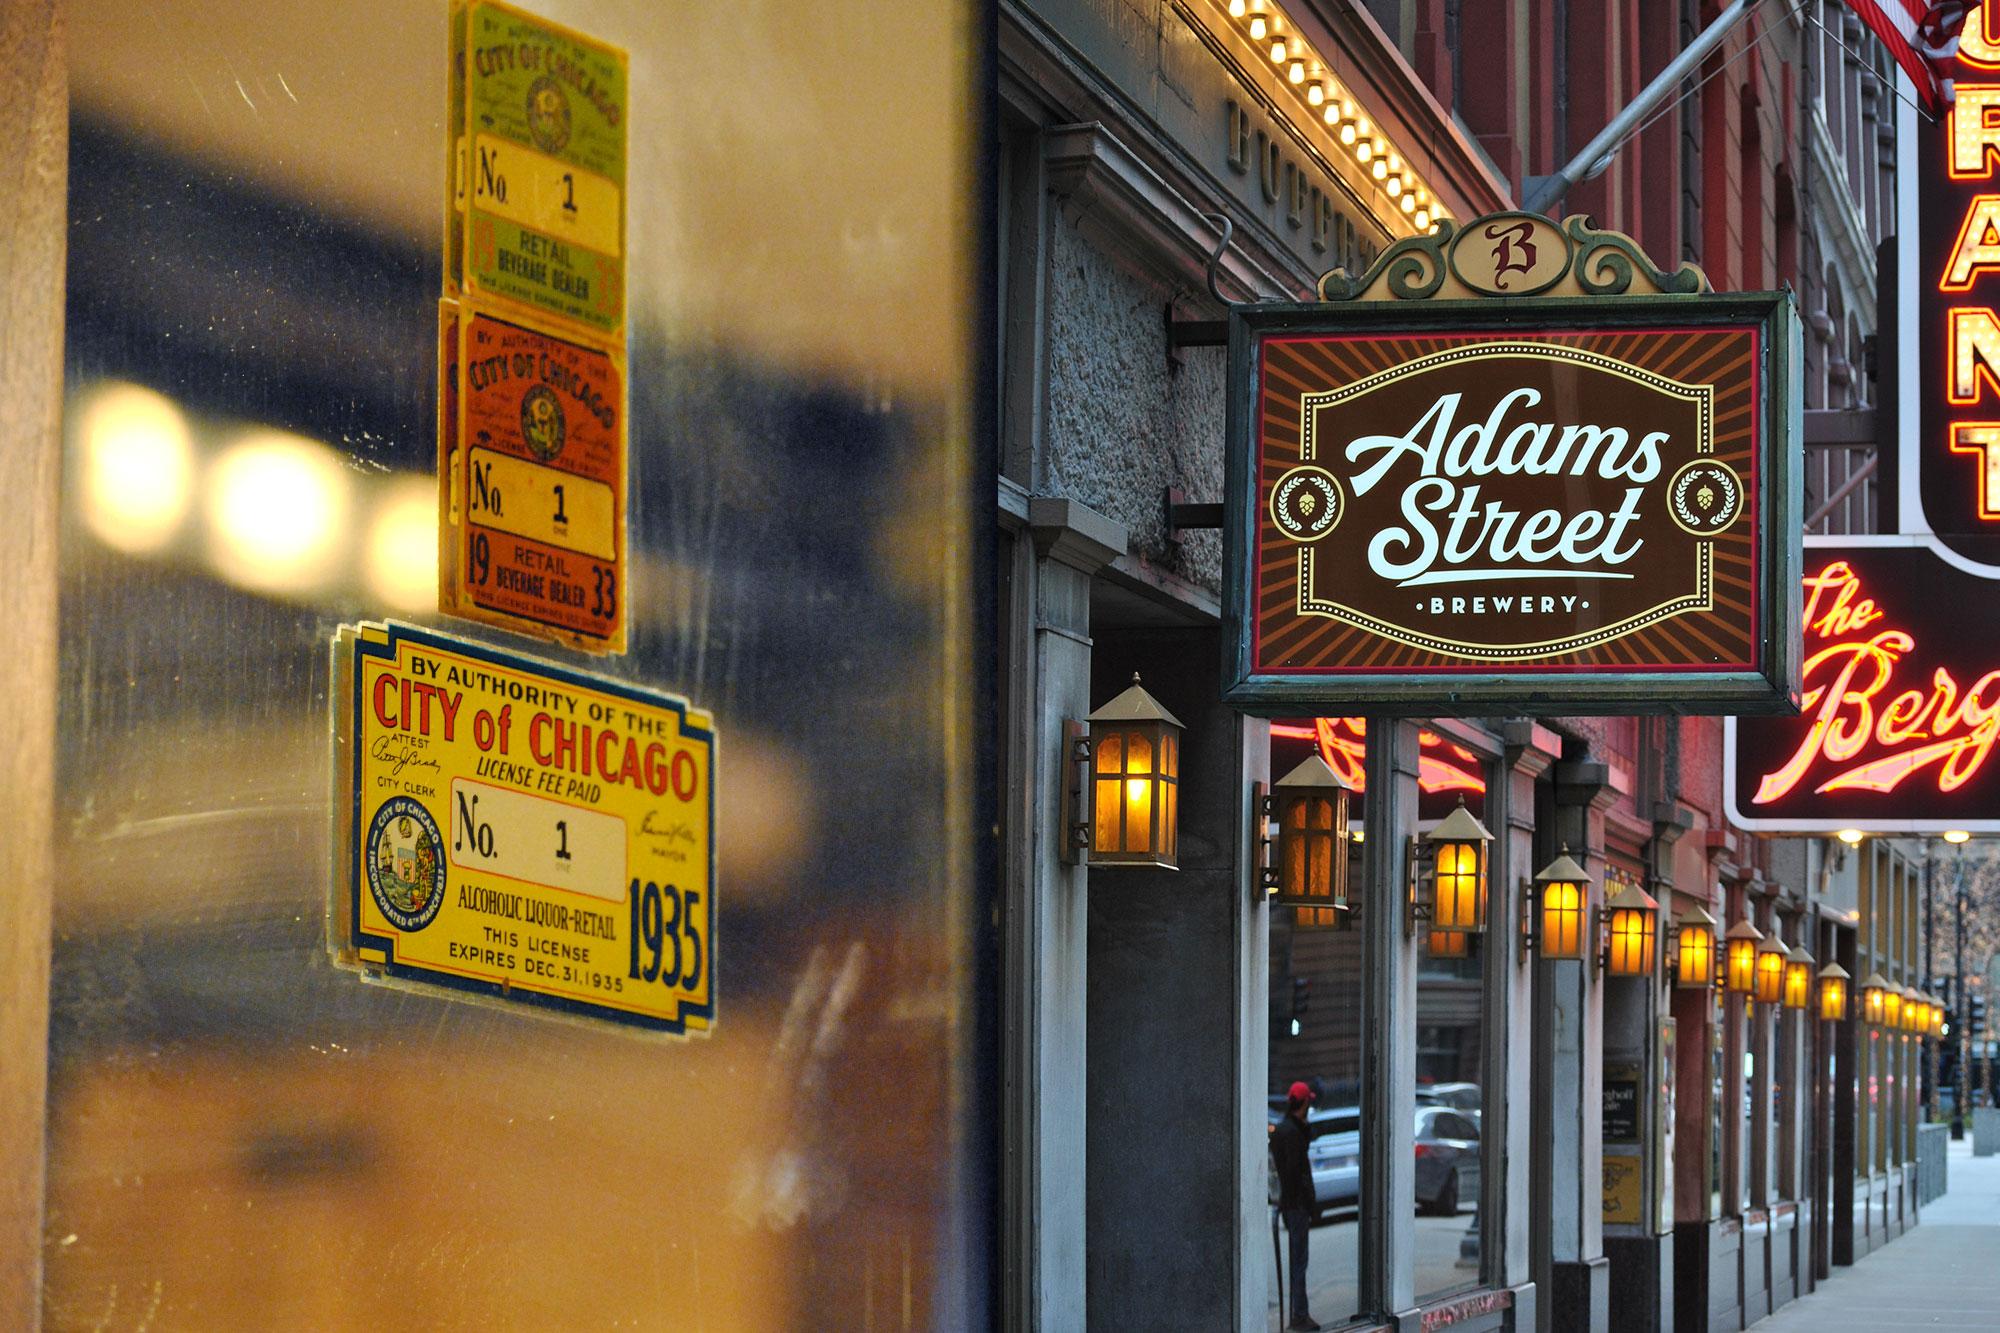 The Berghoff's original bar bears the historic 'Liquor License No. 1' badge, post-Prohibition.